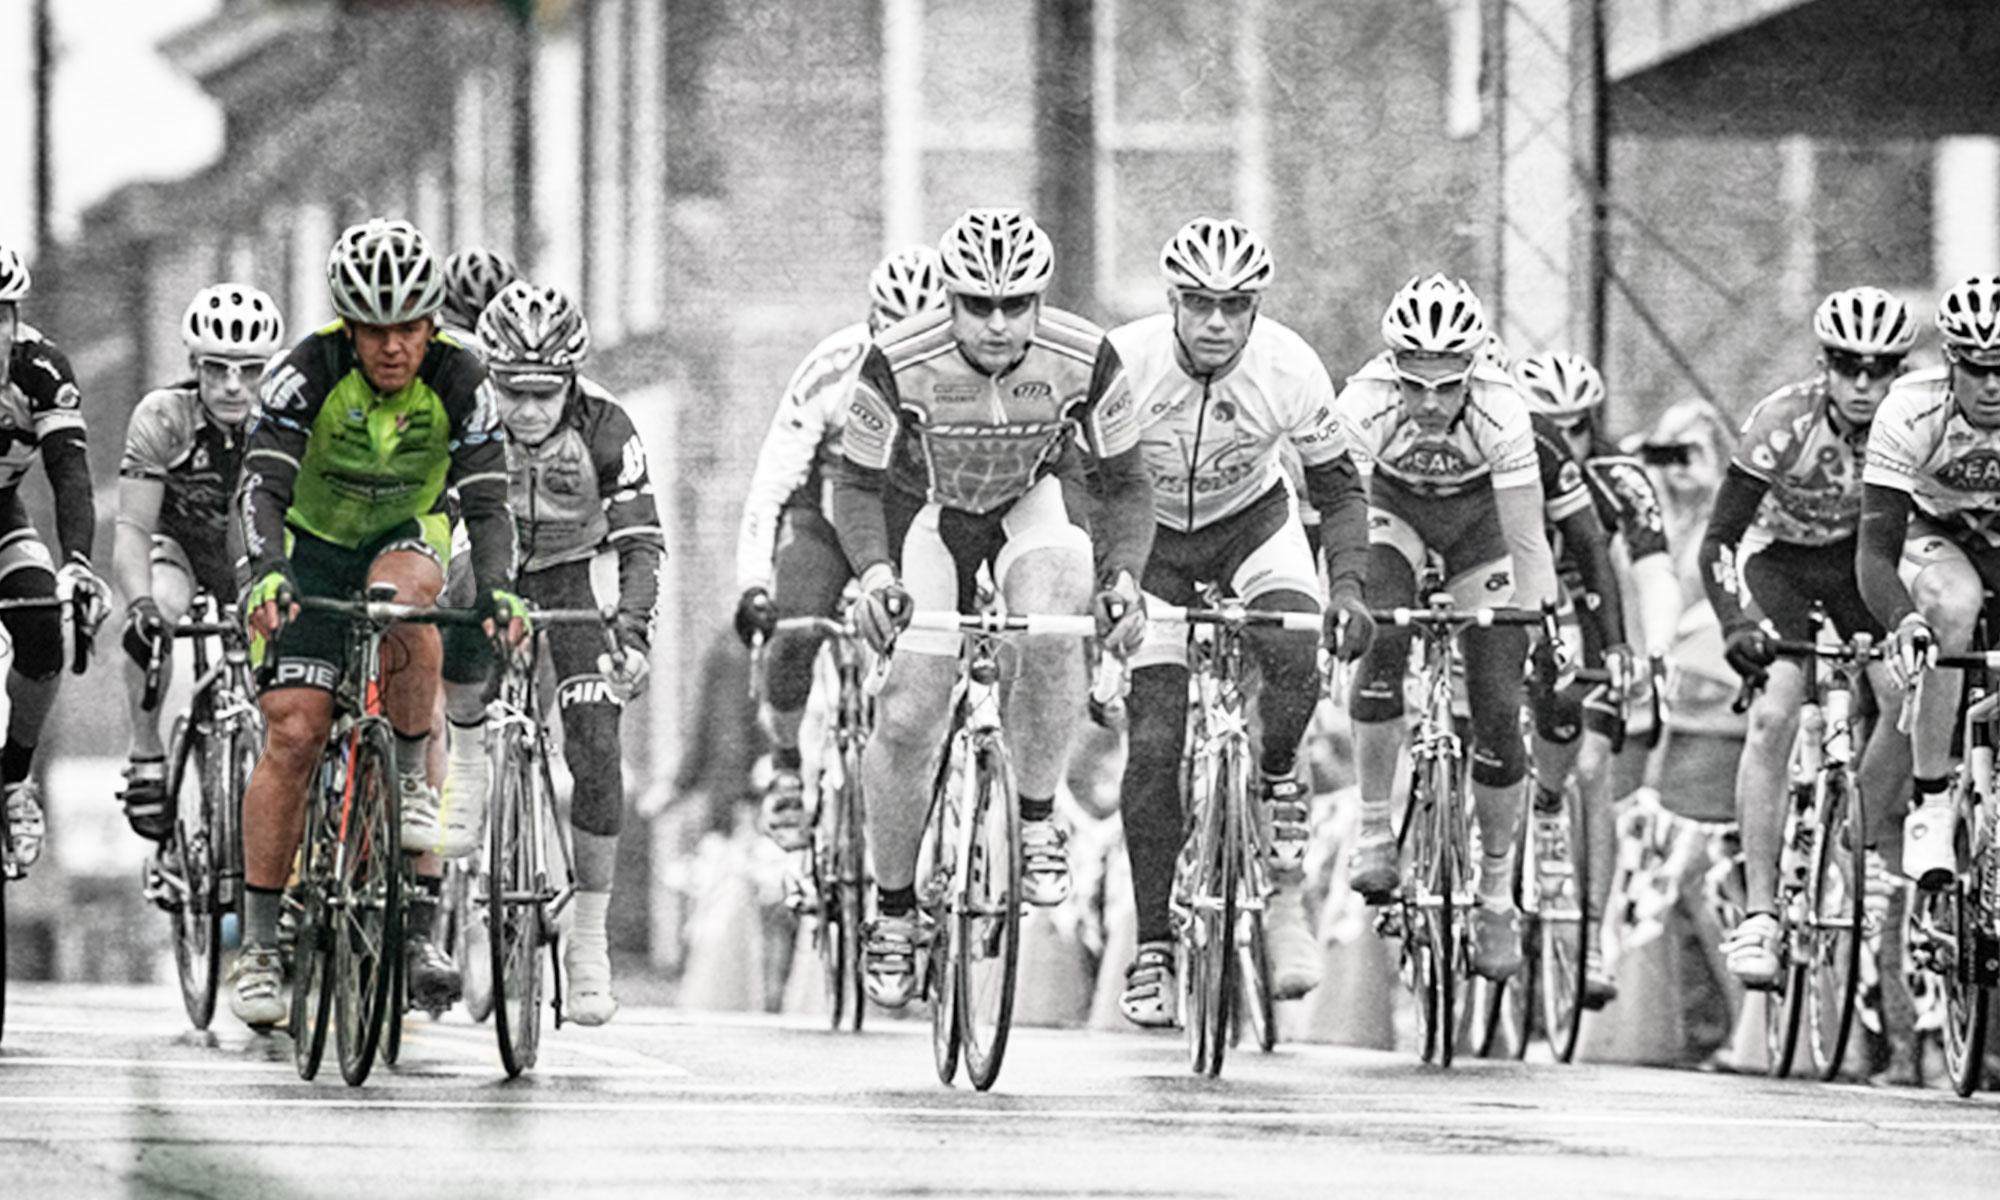 Nigel Duckworth | Cycling | Asheboro Criterium